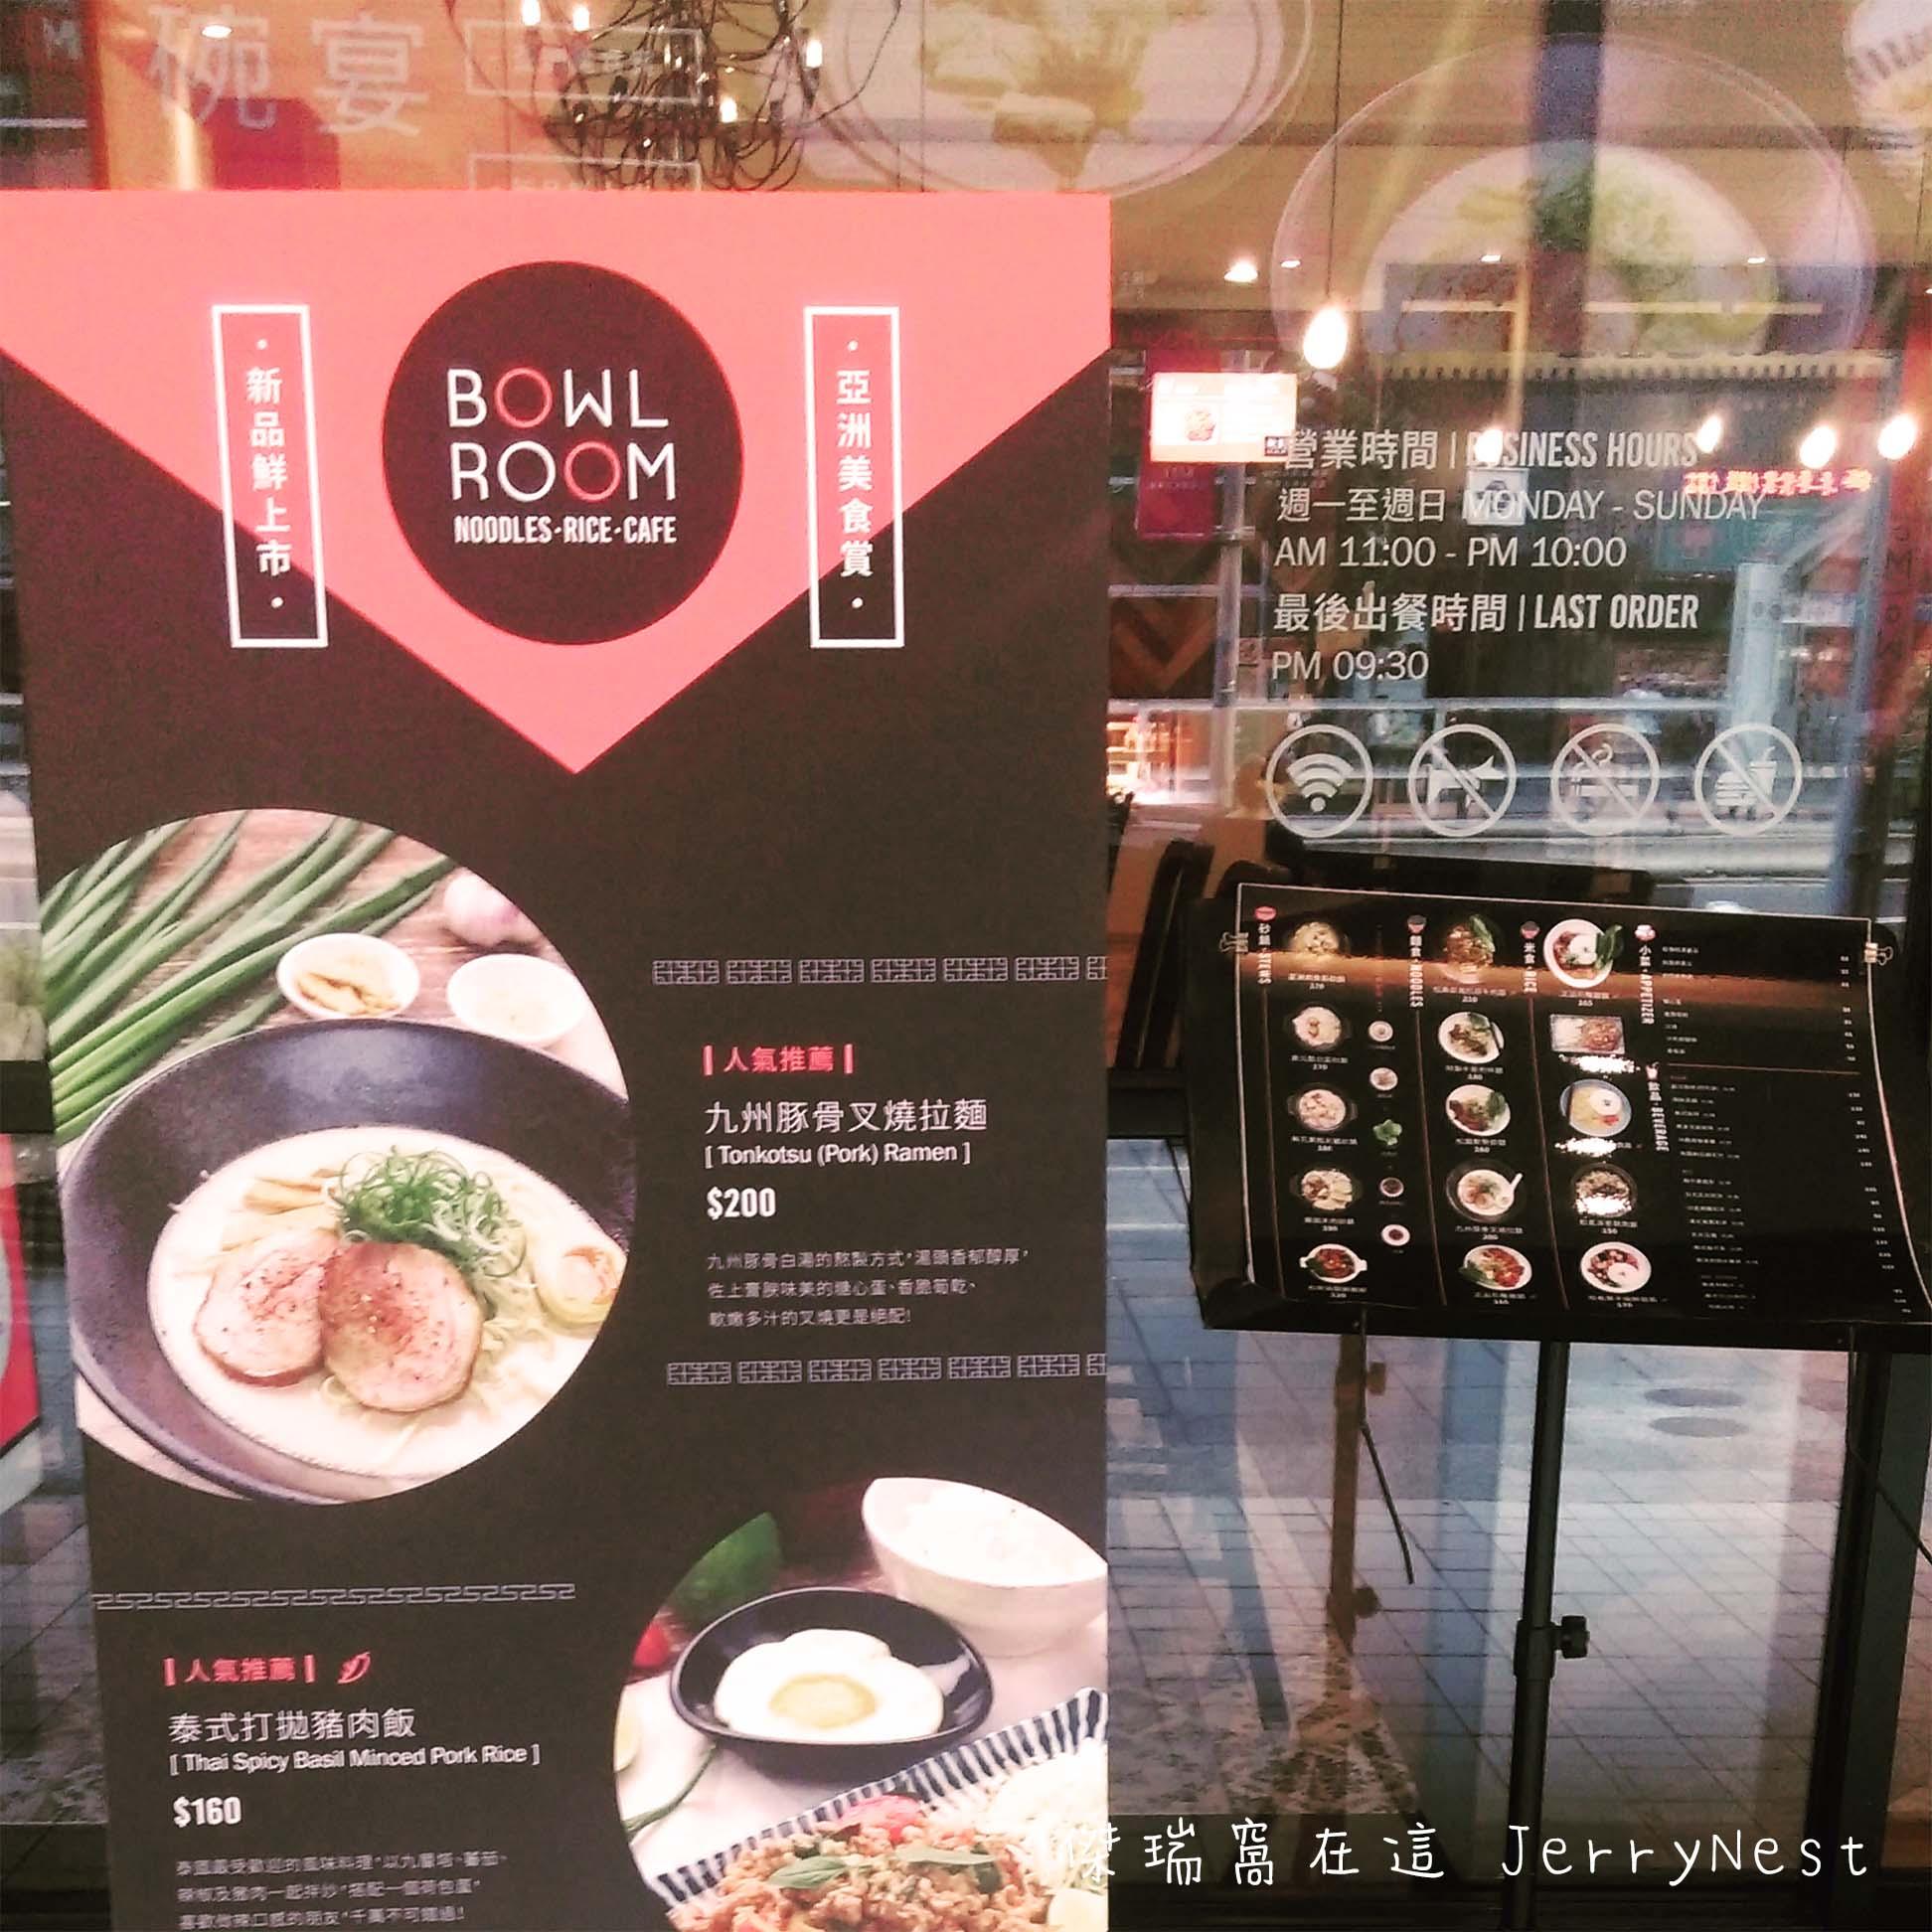 bb4 - 台北微風廣場|用碗喝飲料的亞洲特色餐廳 碗宴 Bowl Room